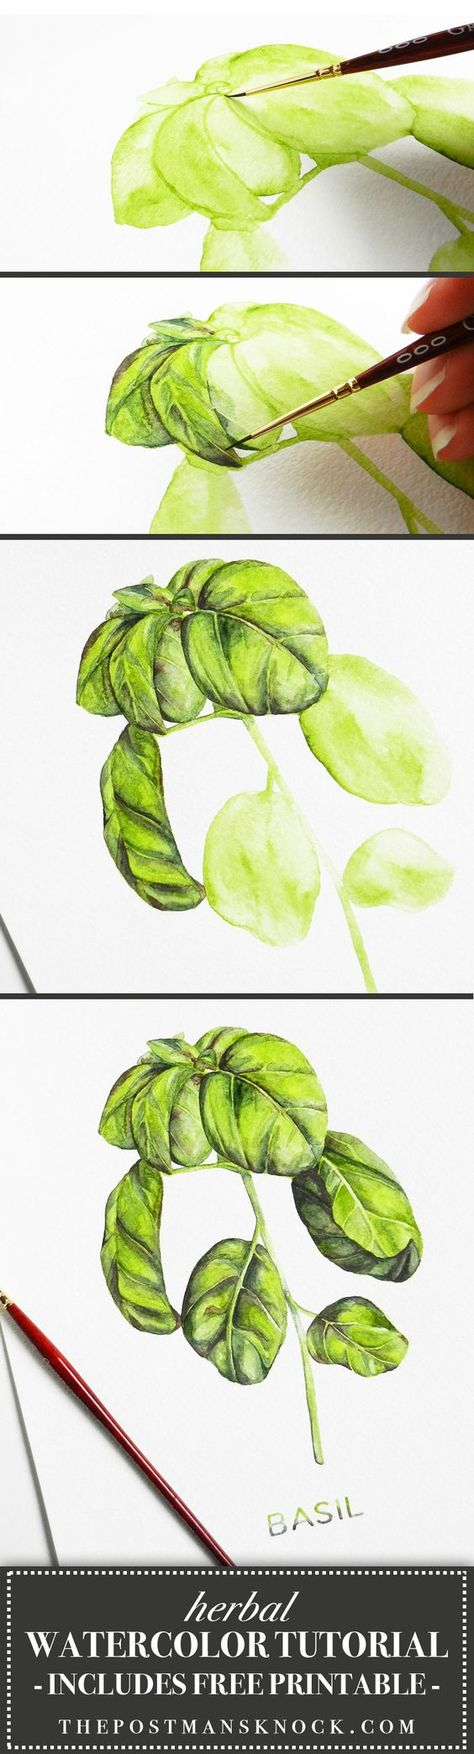 Herbal Watercolor Tutorial + a Free Printable